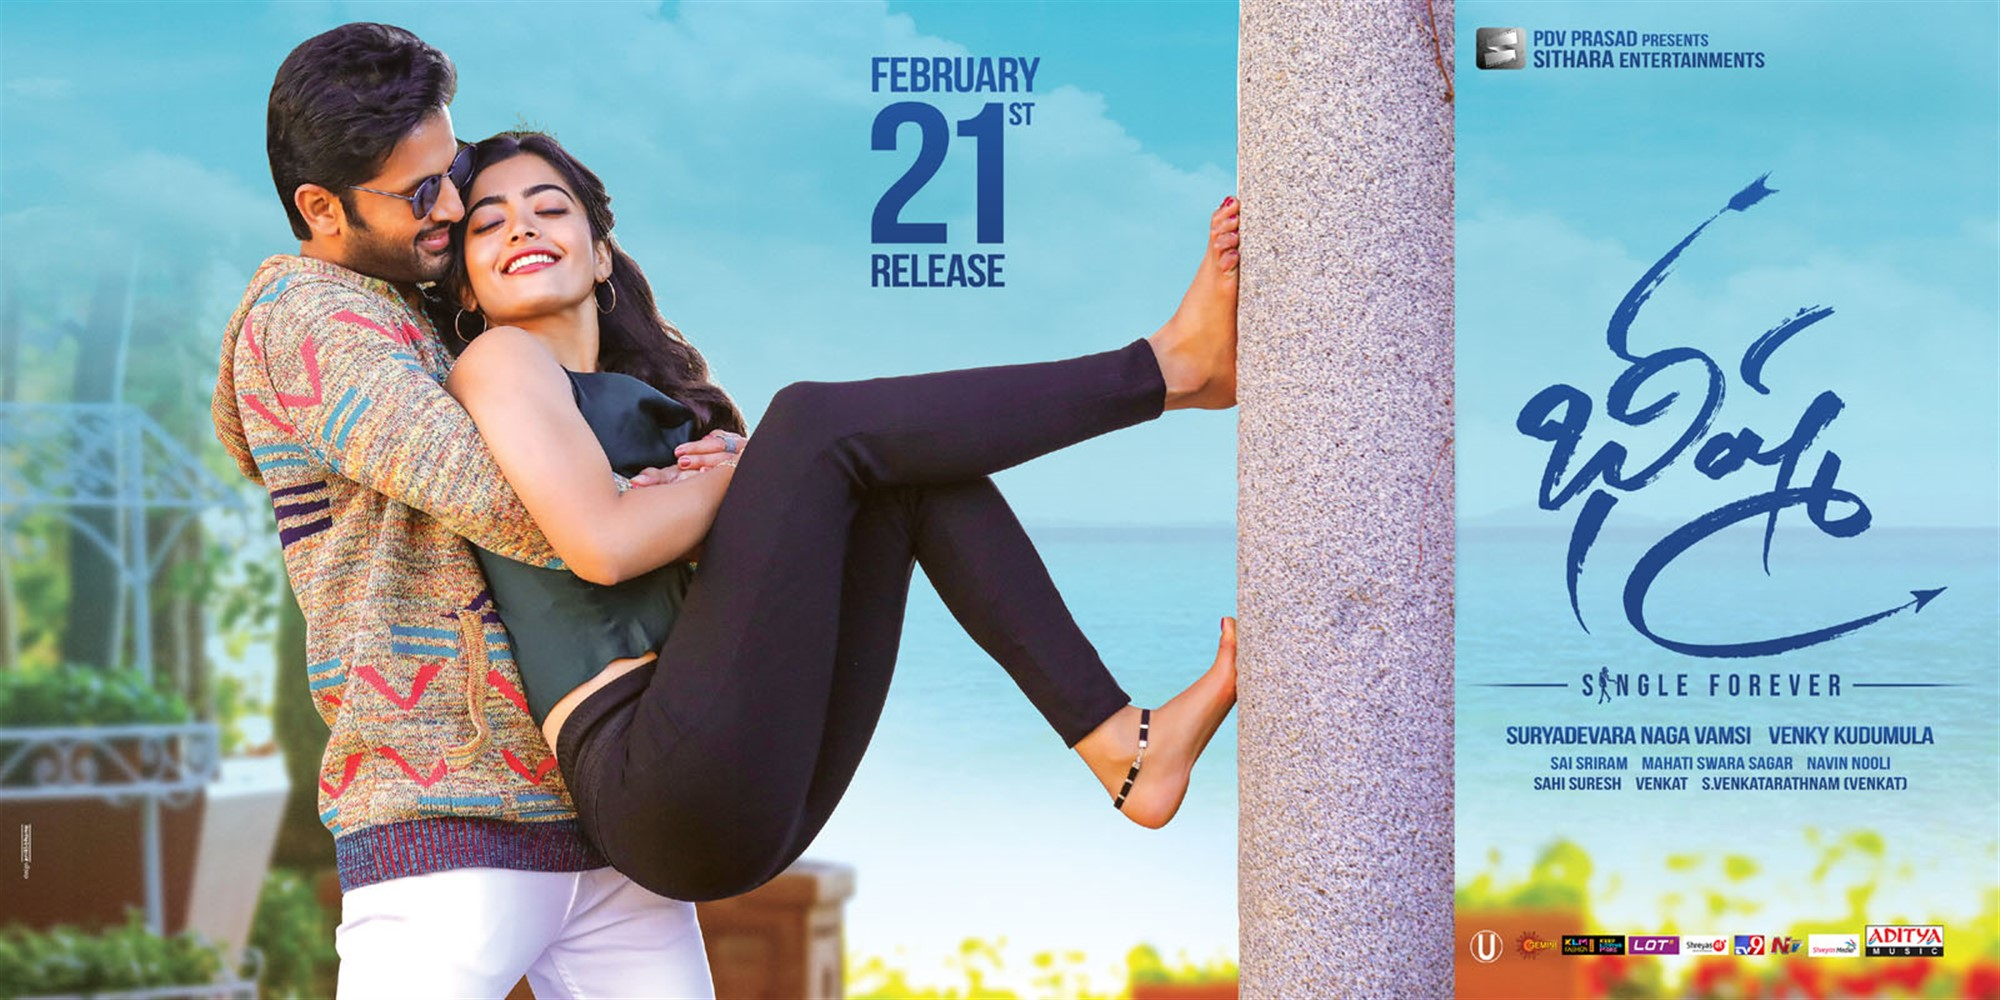 Bheeshma Movie Hd Wallpapers Nitin Rashmika Mandanna New Movie Posters